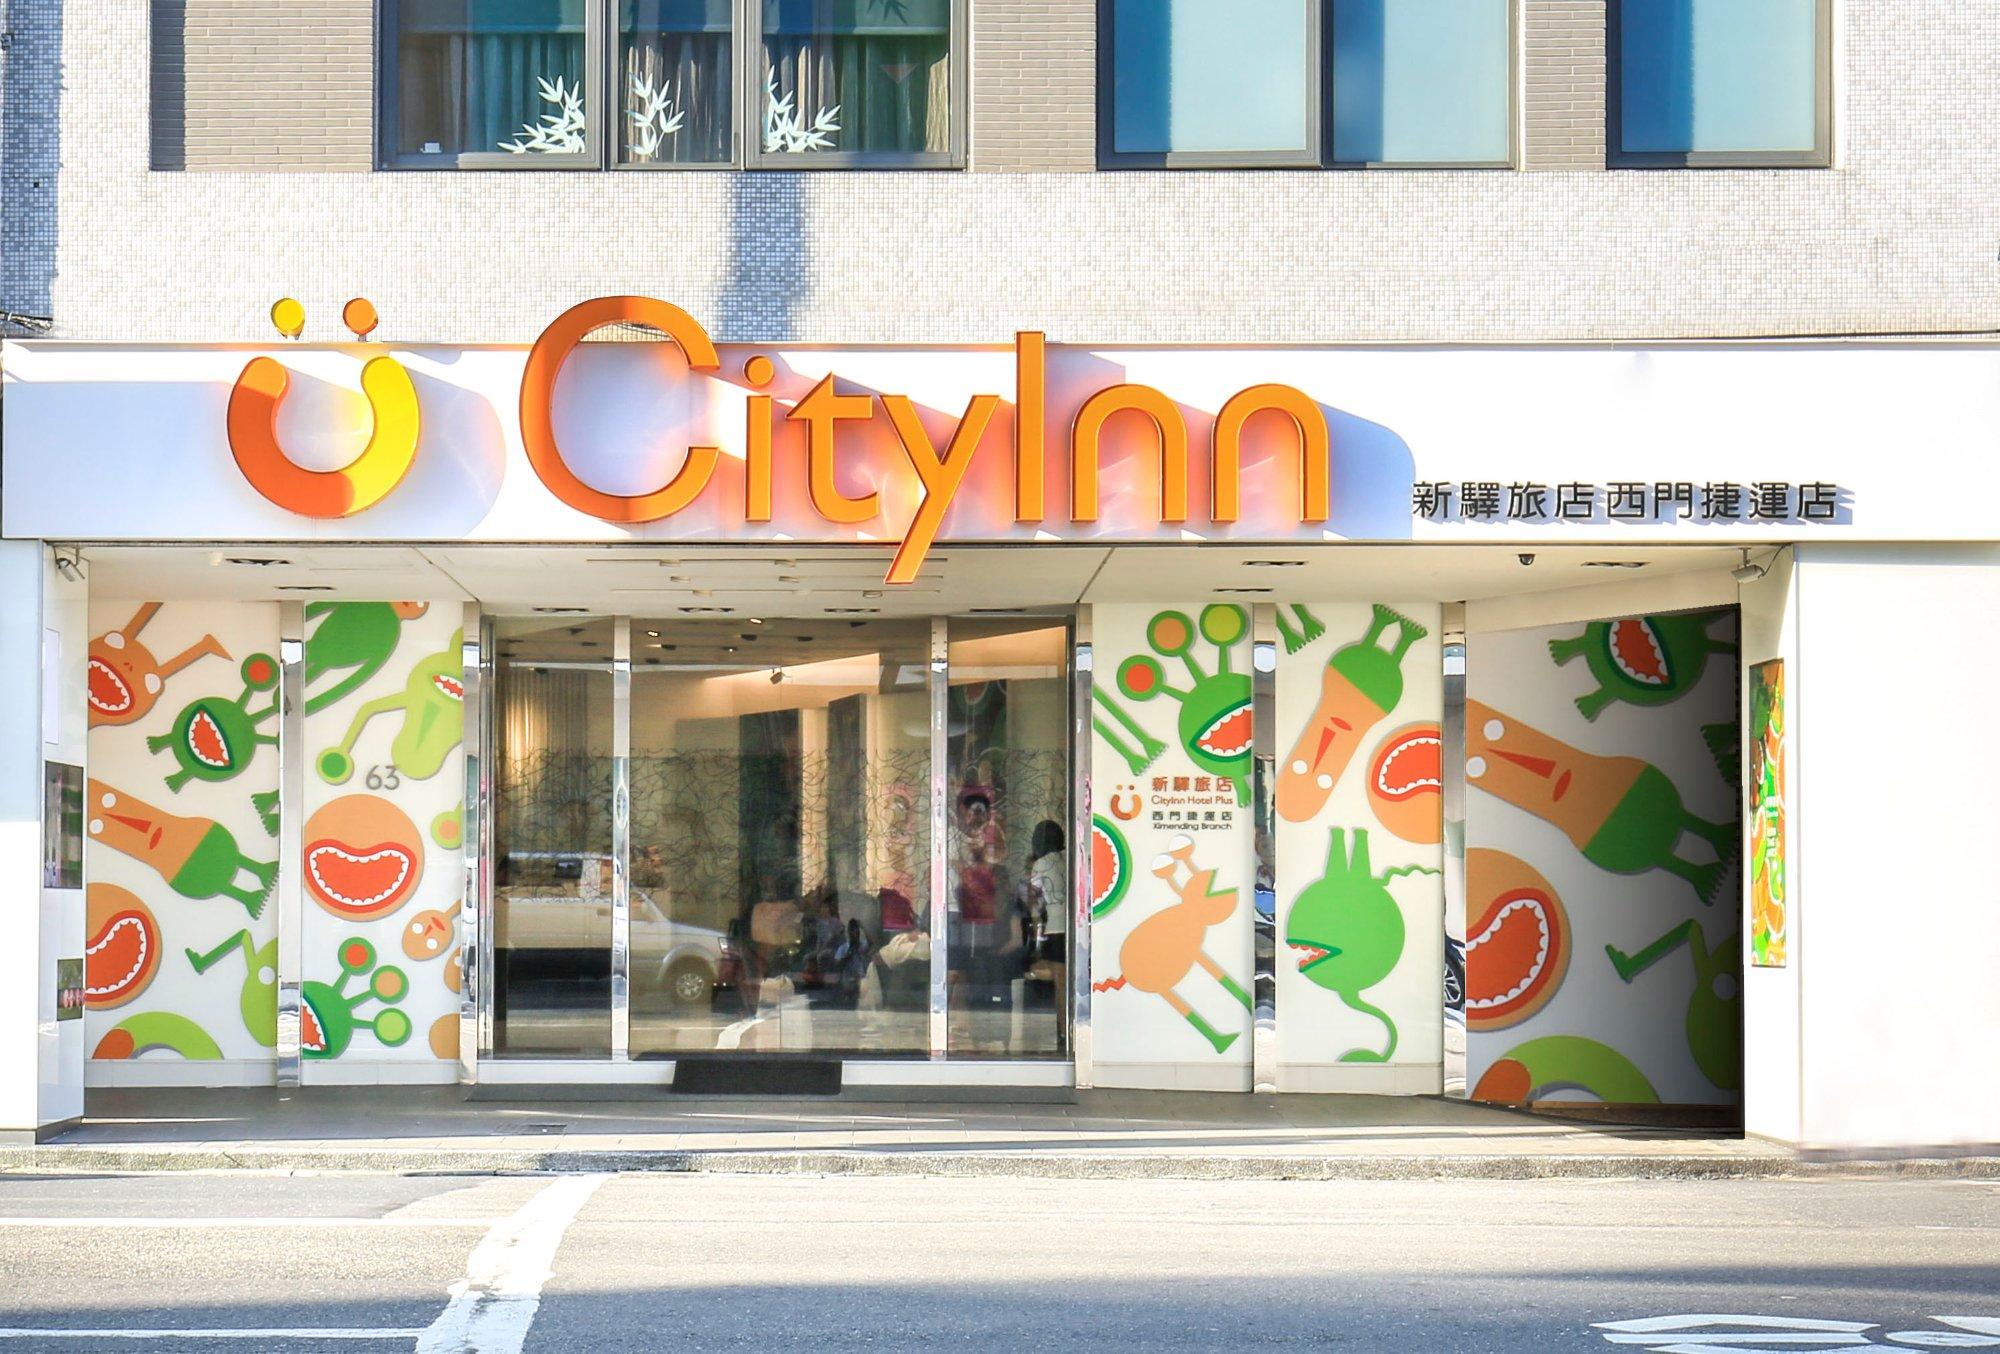 CityInn Hotel Plus - Ximending Branch